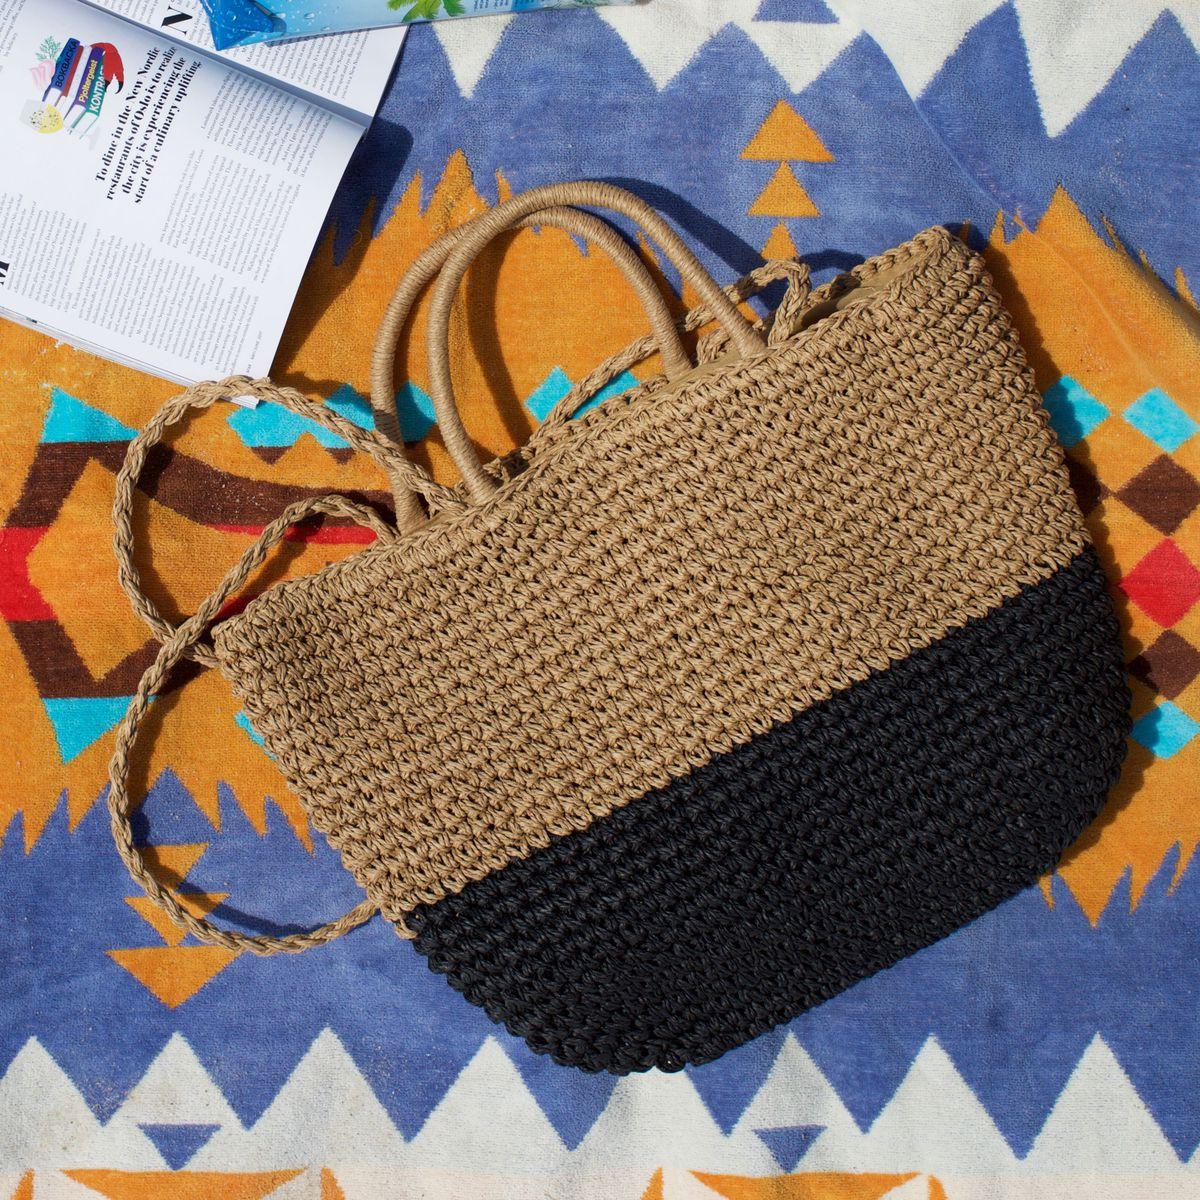 A raffia purse